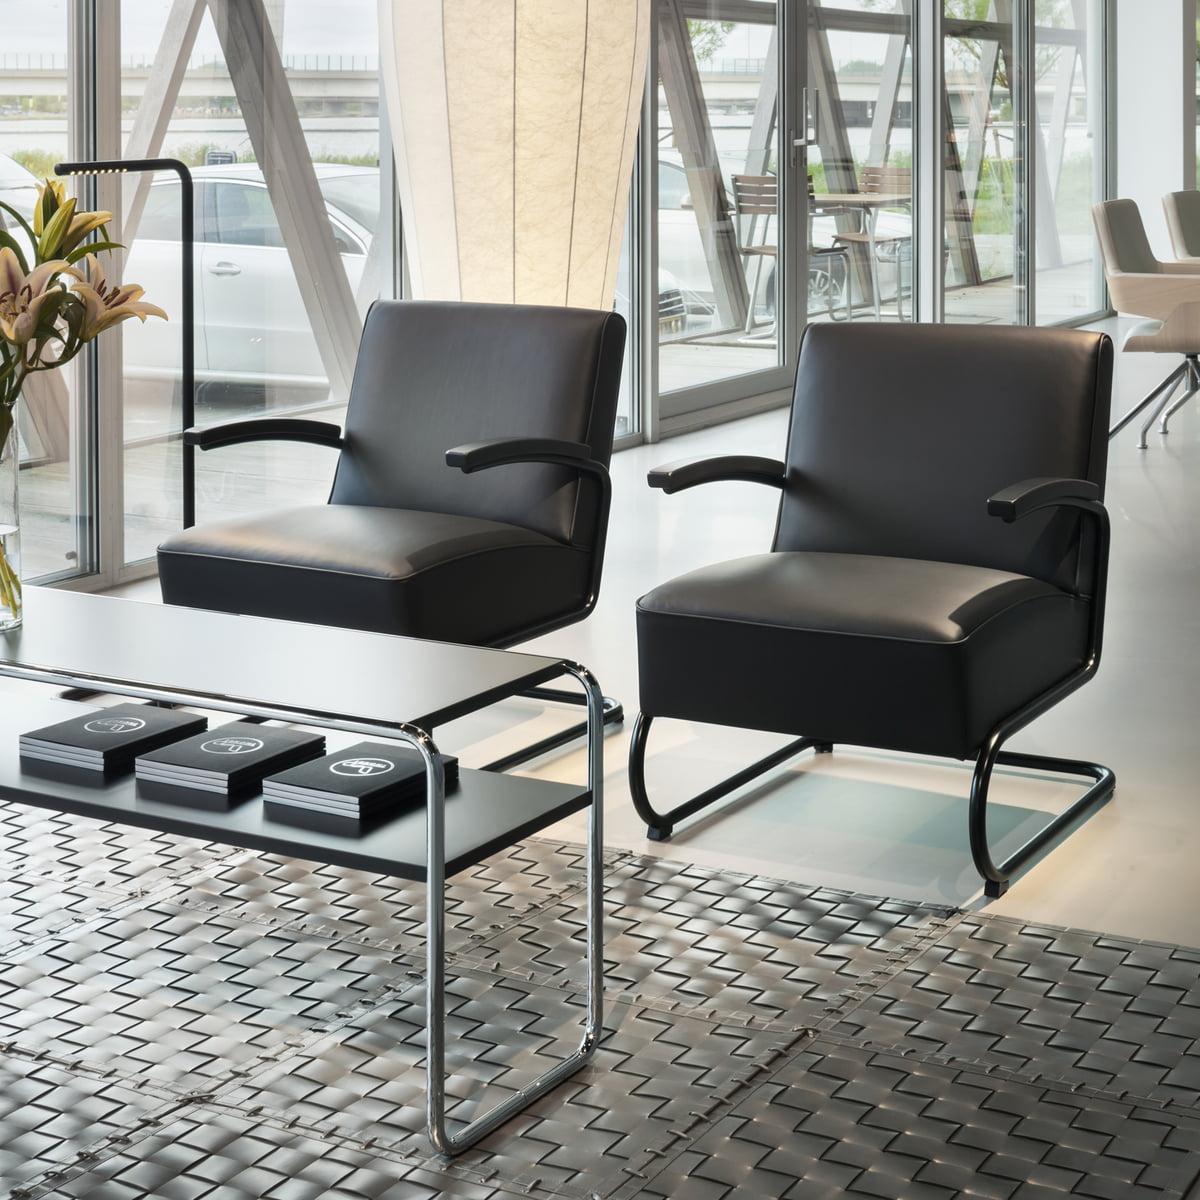 s 411 sessel von thonet connox shop kaufen. Black Bedroom Furniture Sets. Home Design Ideas